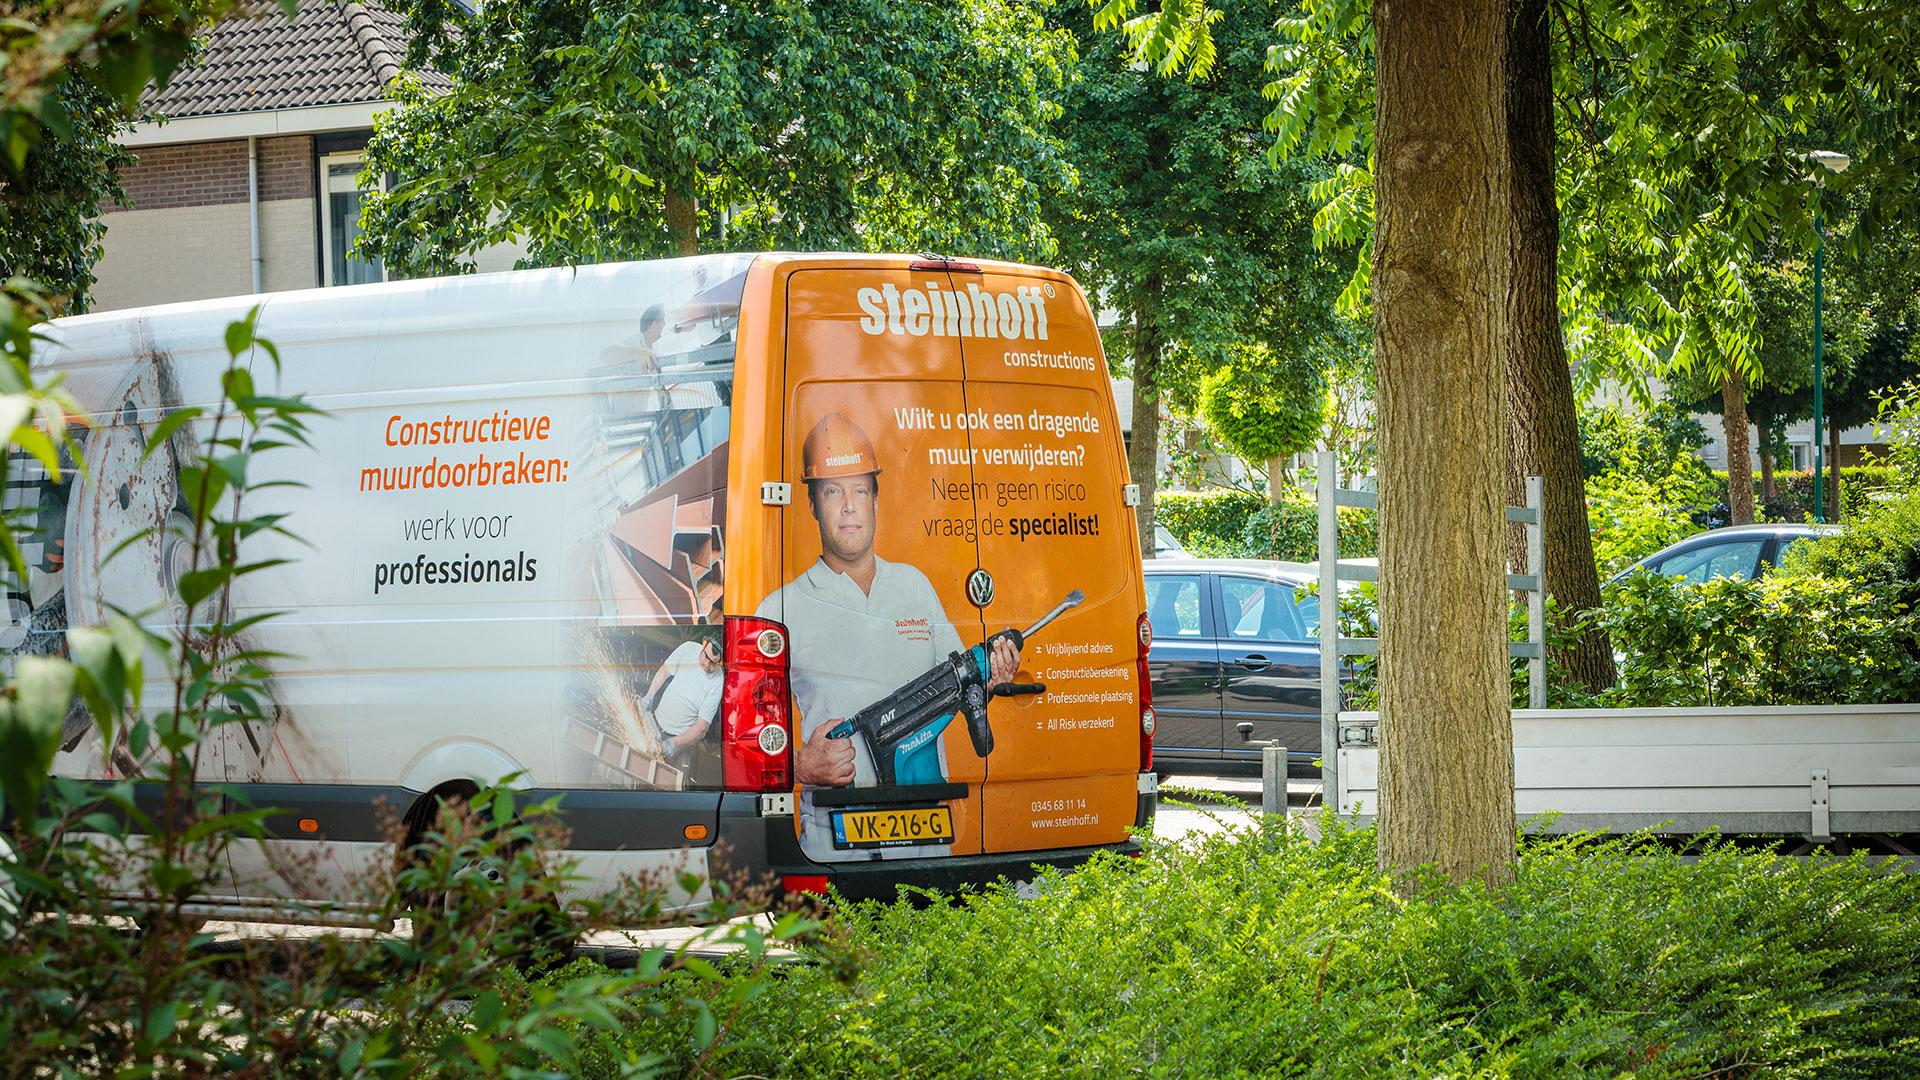 Steinhoff -  Draagmuur verwijderen - Bus